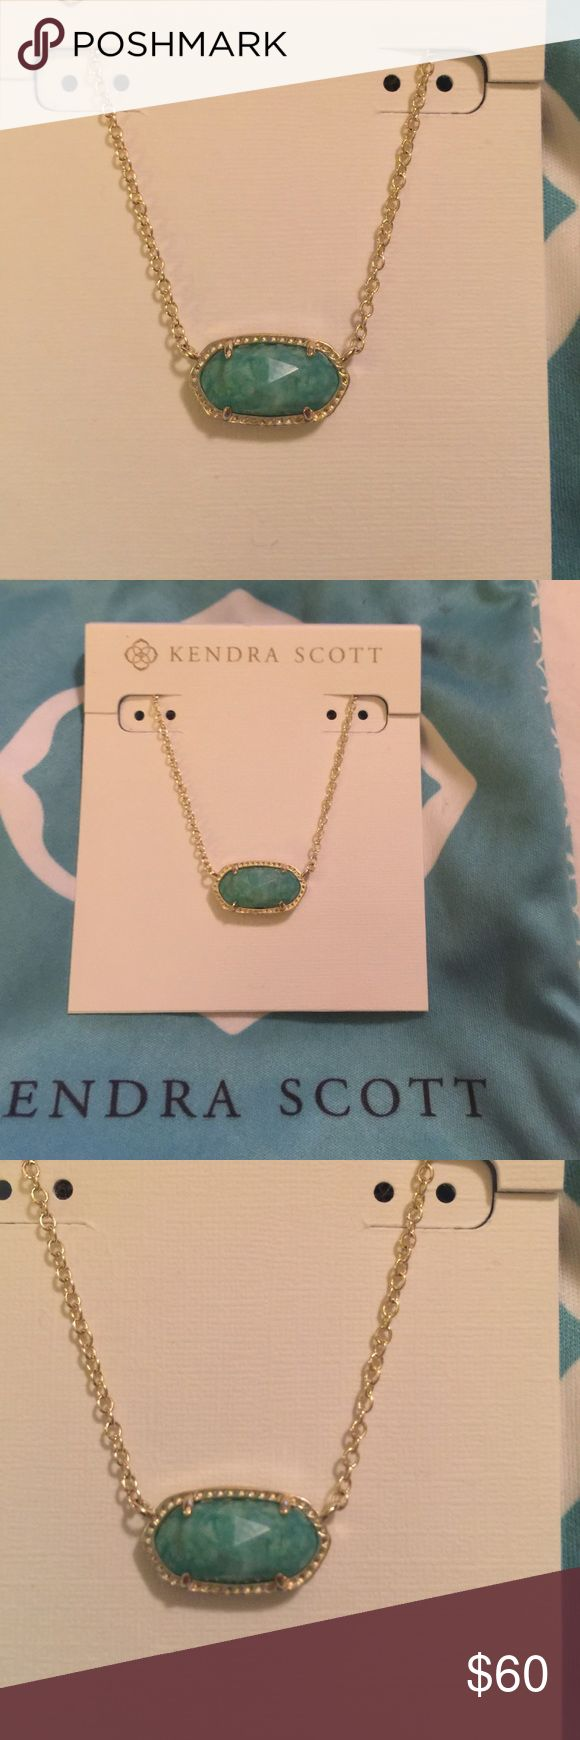 Kendra Scott Elisa Kendra Scott Elisa pendent in gold and amzonite Kendra Scott Jewelry Necklaces